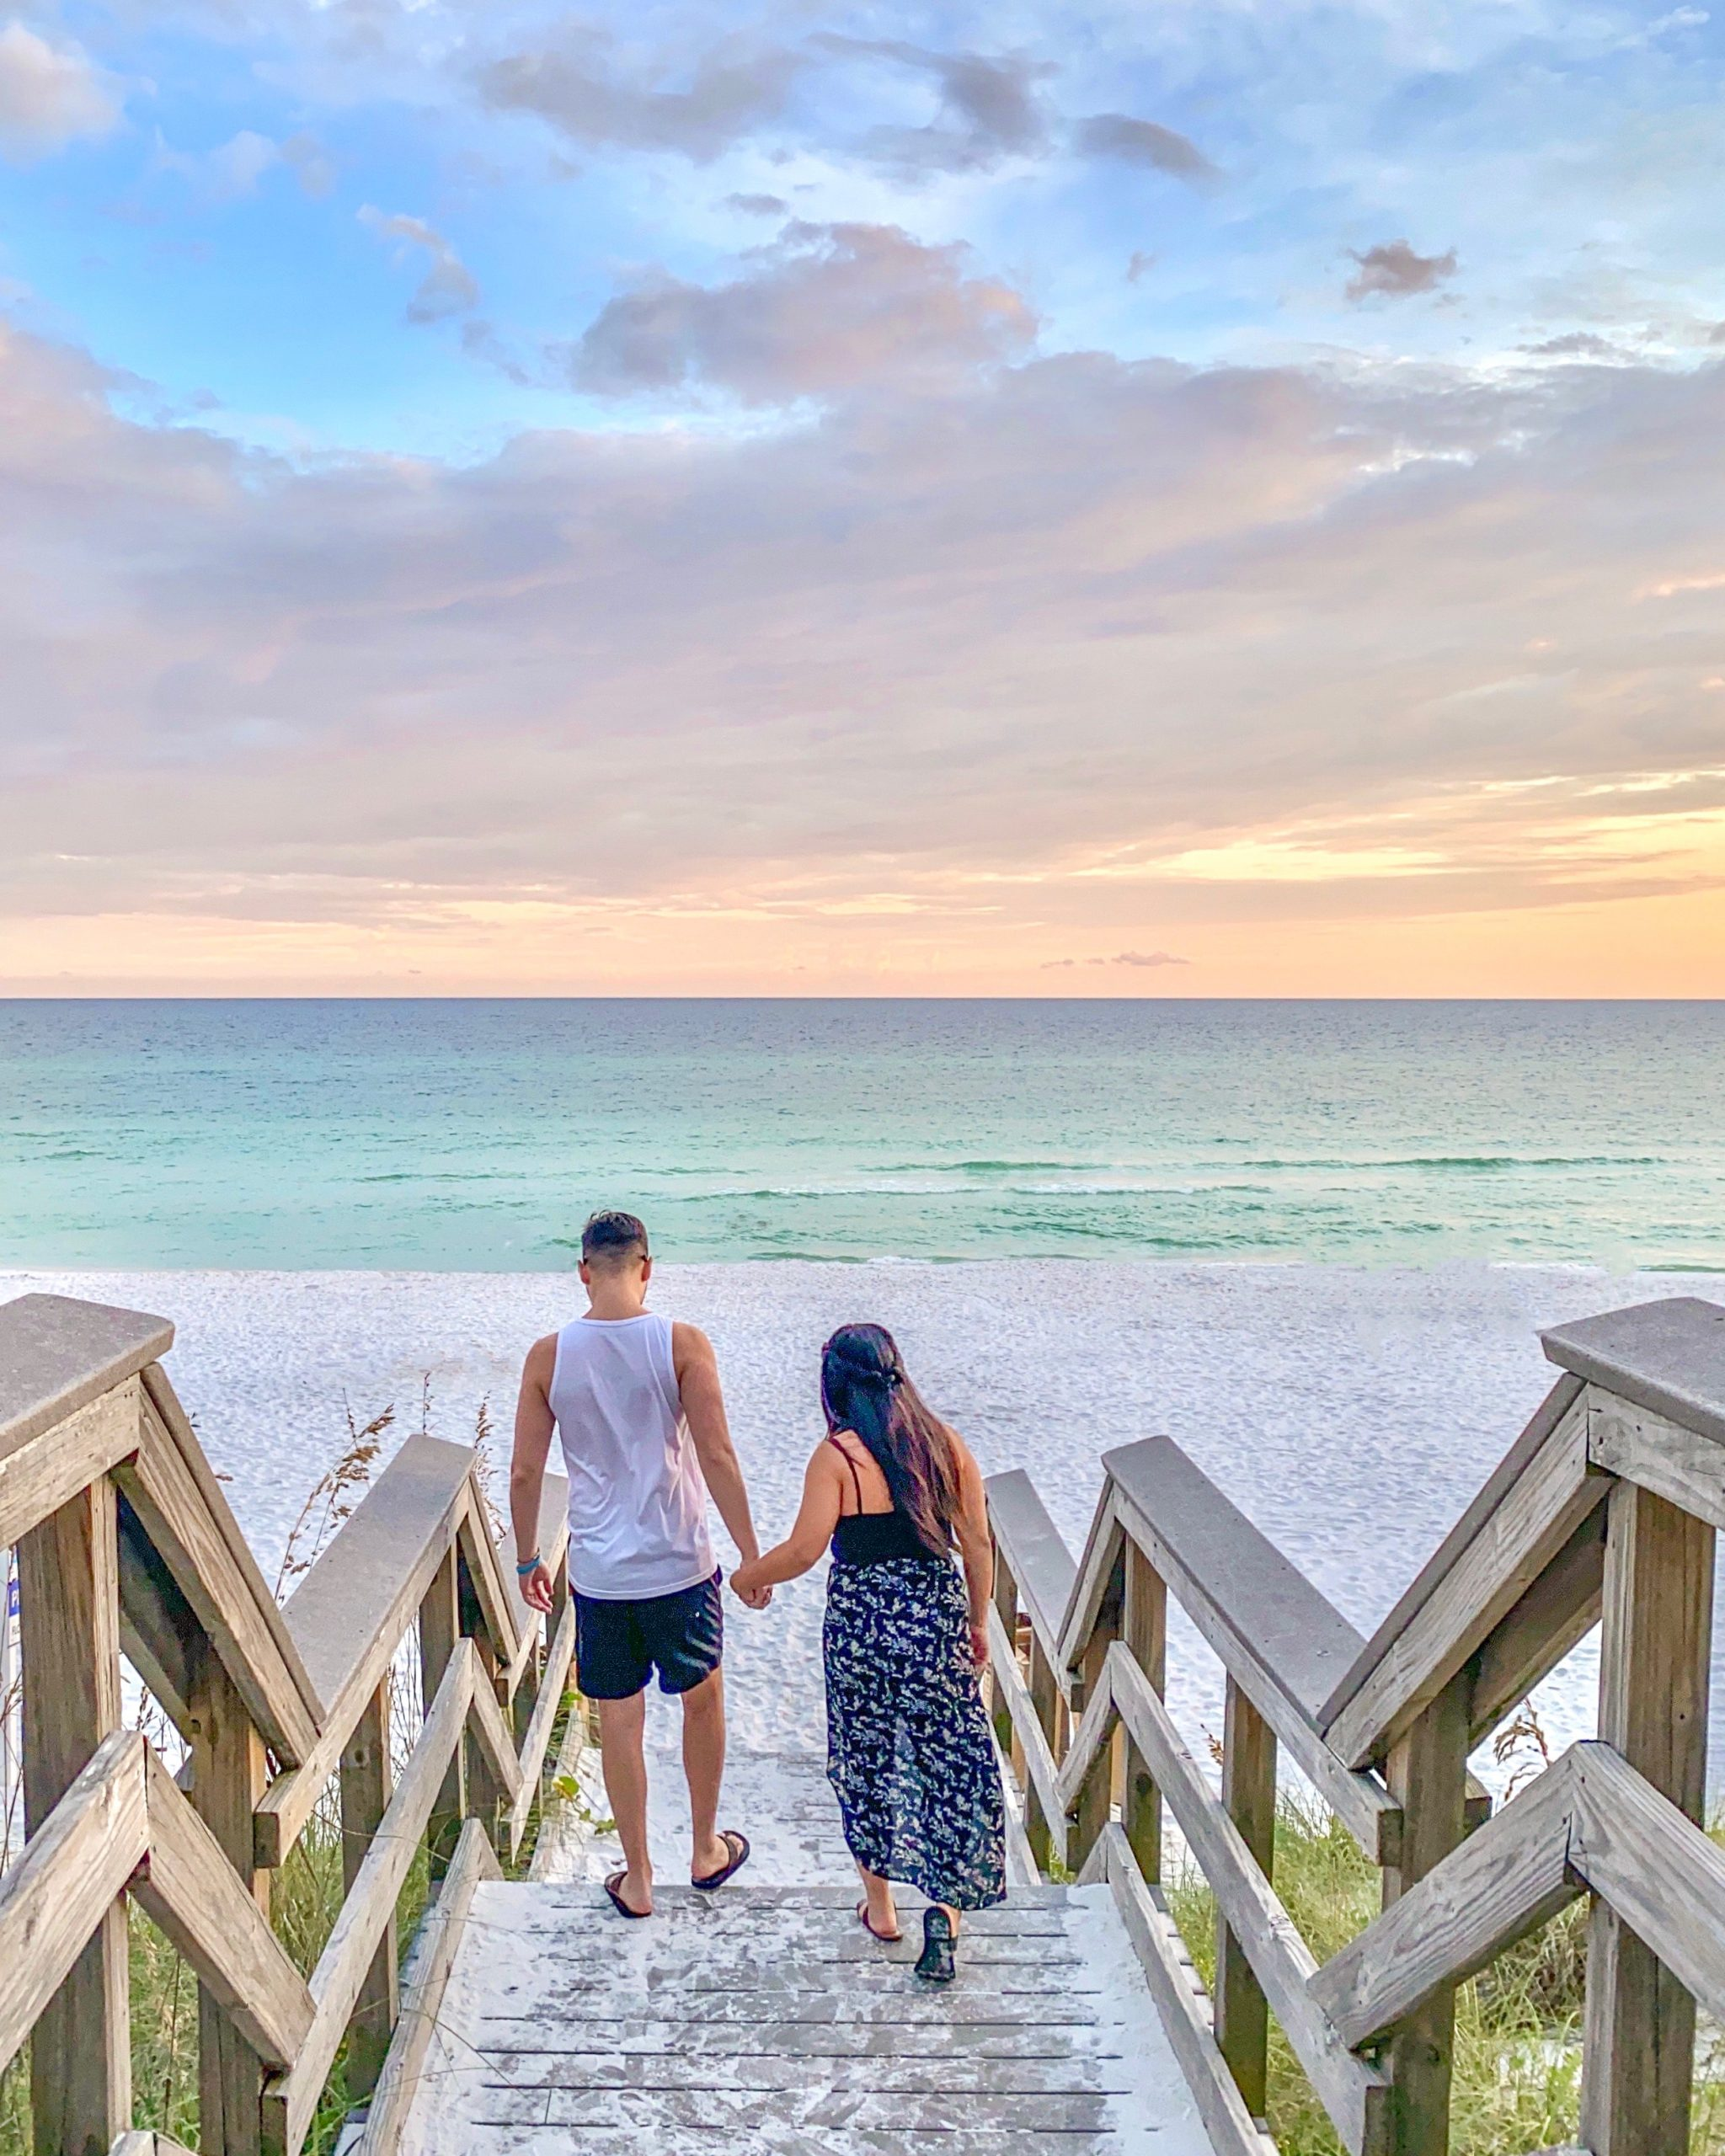 couple at Miramar Beach, Destin during sunset